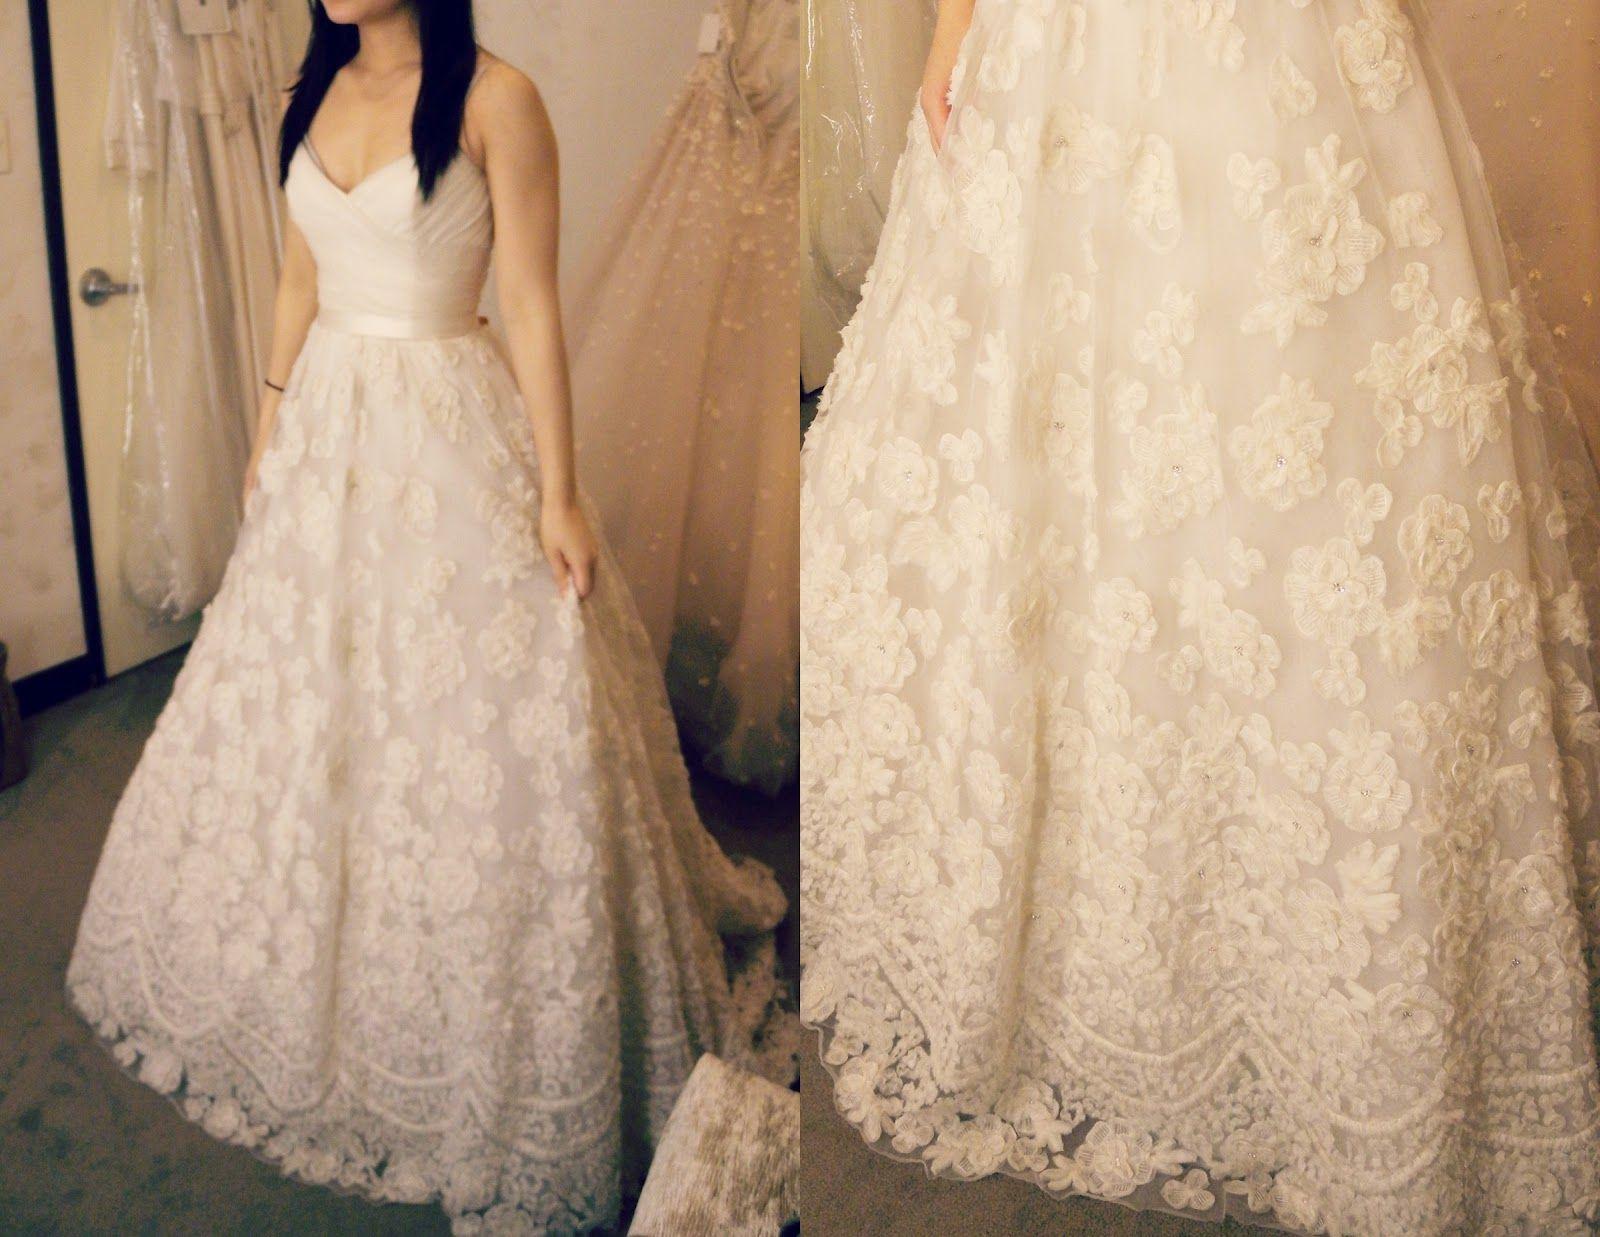 100+ Saks Fifth Ave Wedding Dresses - Plus Size Dresses for Wedding ...